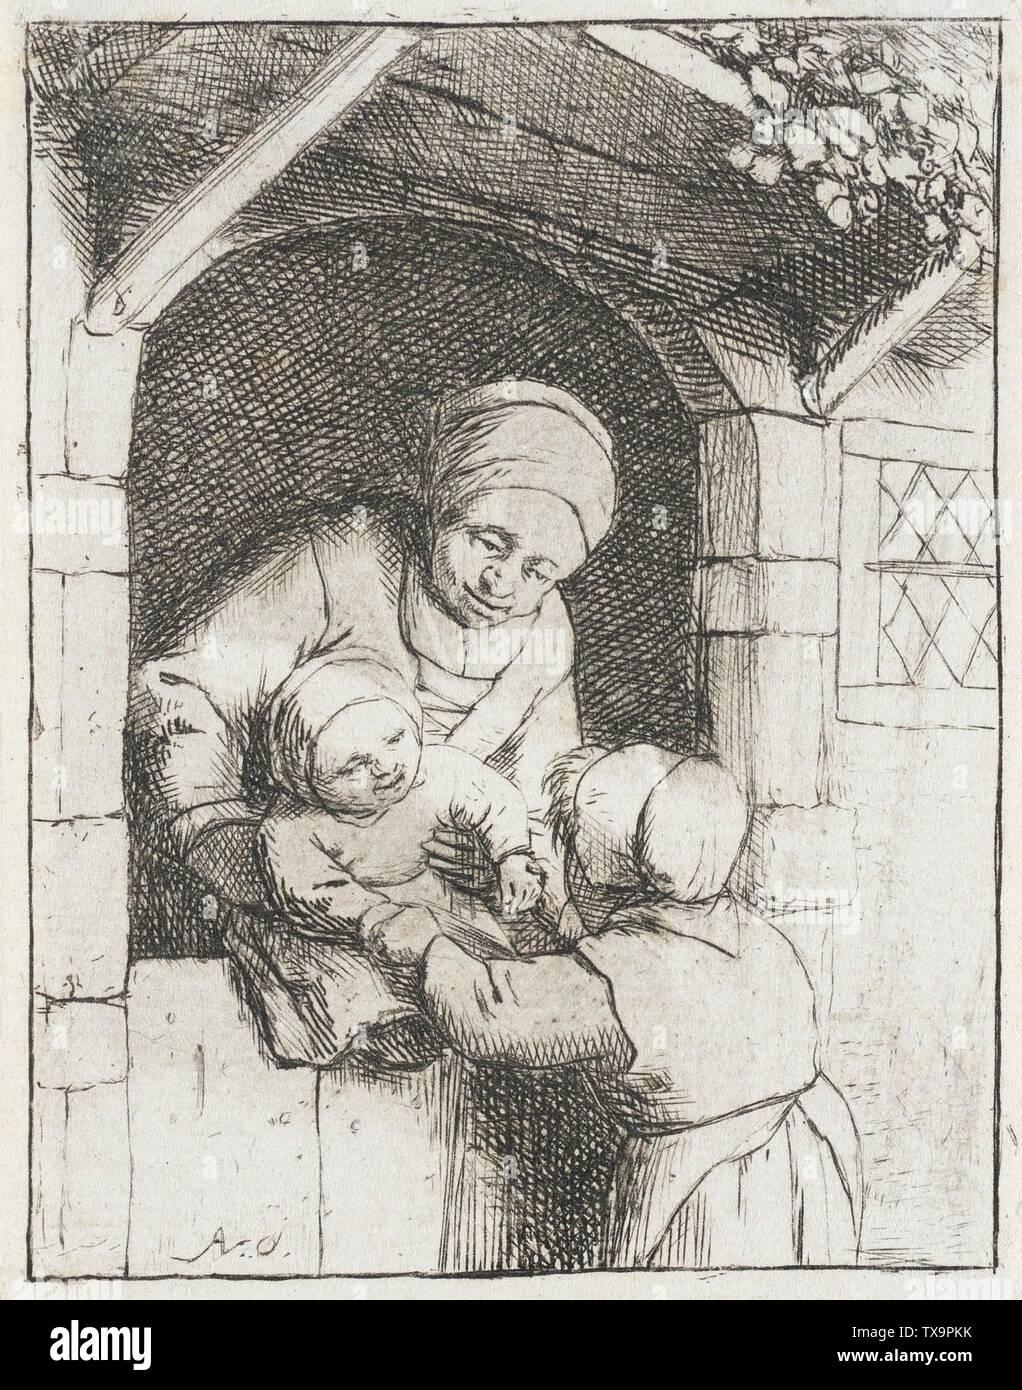 'Mother with Two Children; English:  Holland, 1675 (?) Alternate Title: La Fillette jouant avec un bébé dan les bras de sa mer Prints; etchings Etching Gift of Mrs. Mary B. Regan (31.21.95) Prints and Drawings; 1675 (?); ' - Stock Image